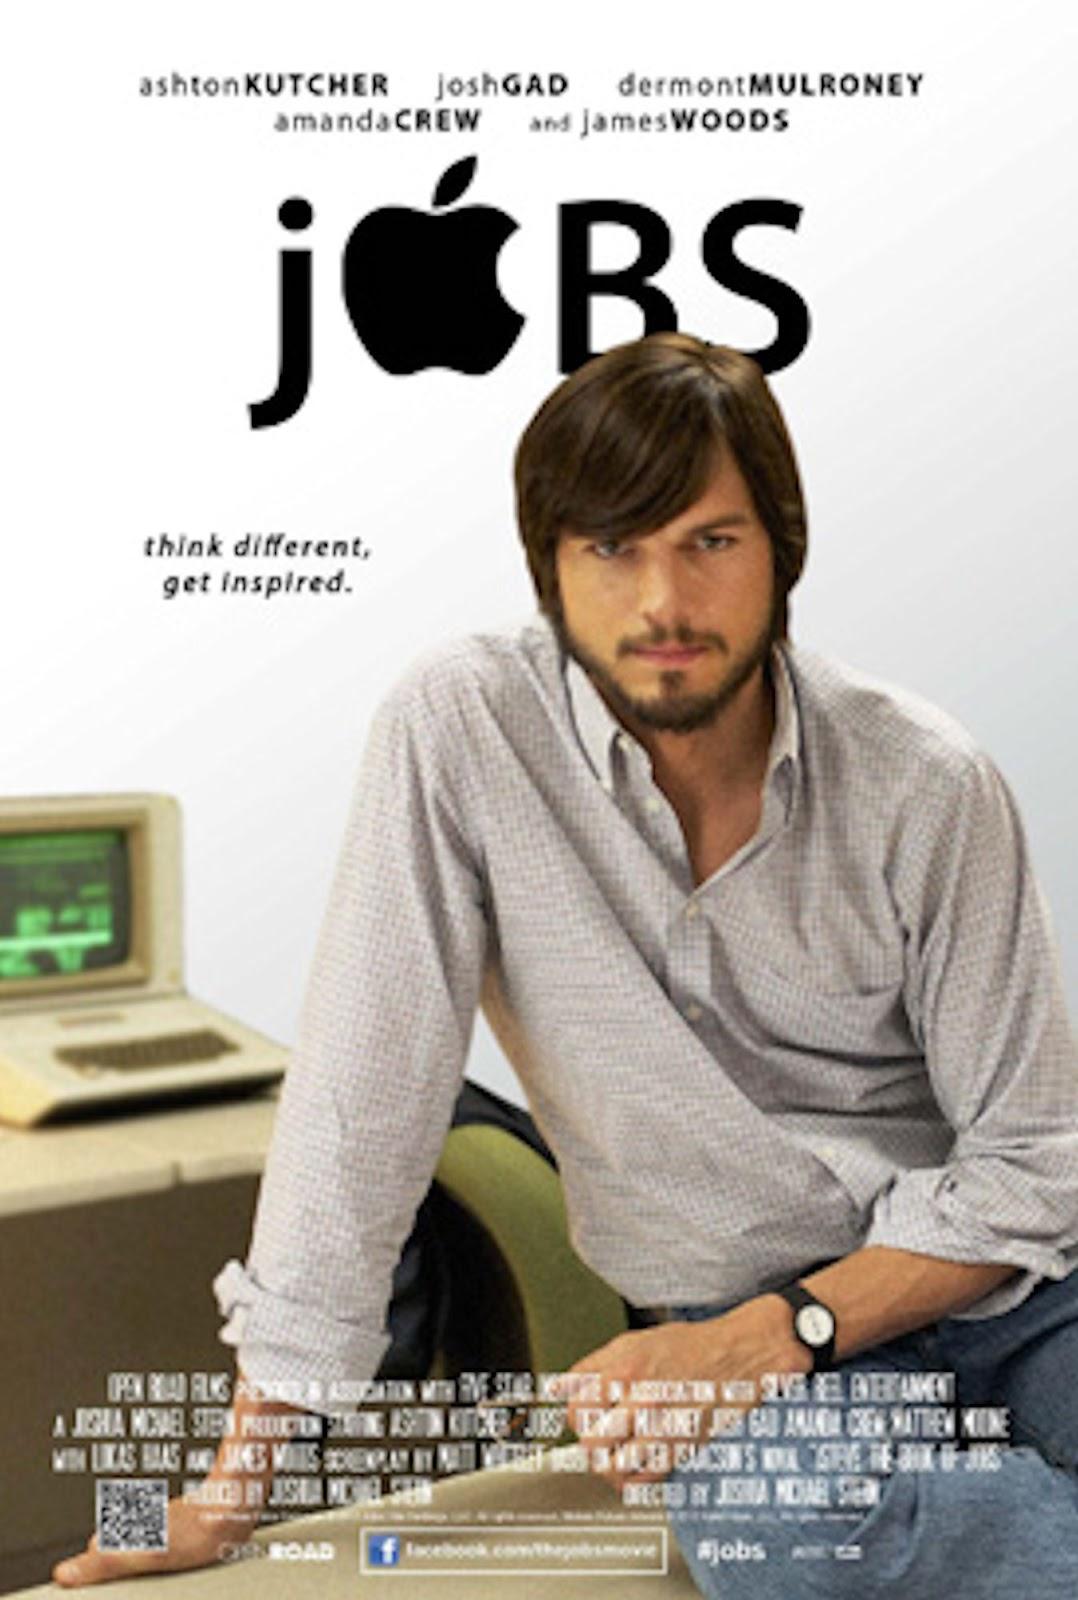 Stunning Resumen Del Libro Steve Jobs El Lider De Apple Images